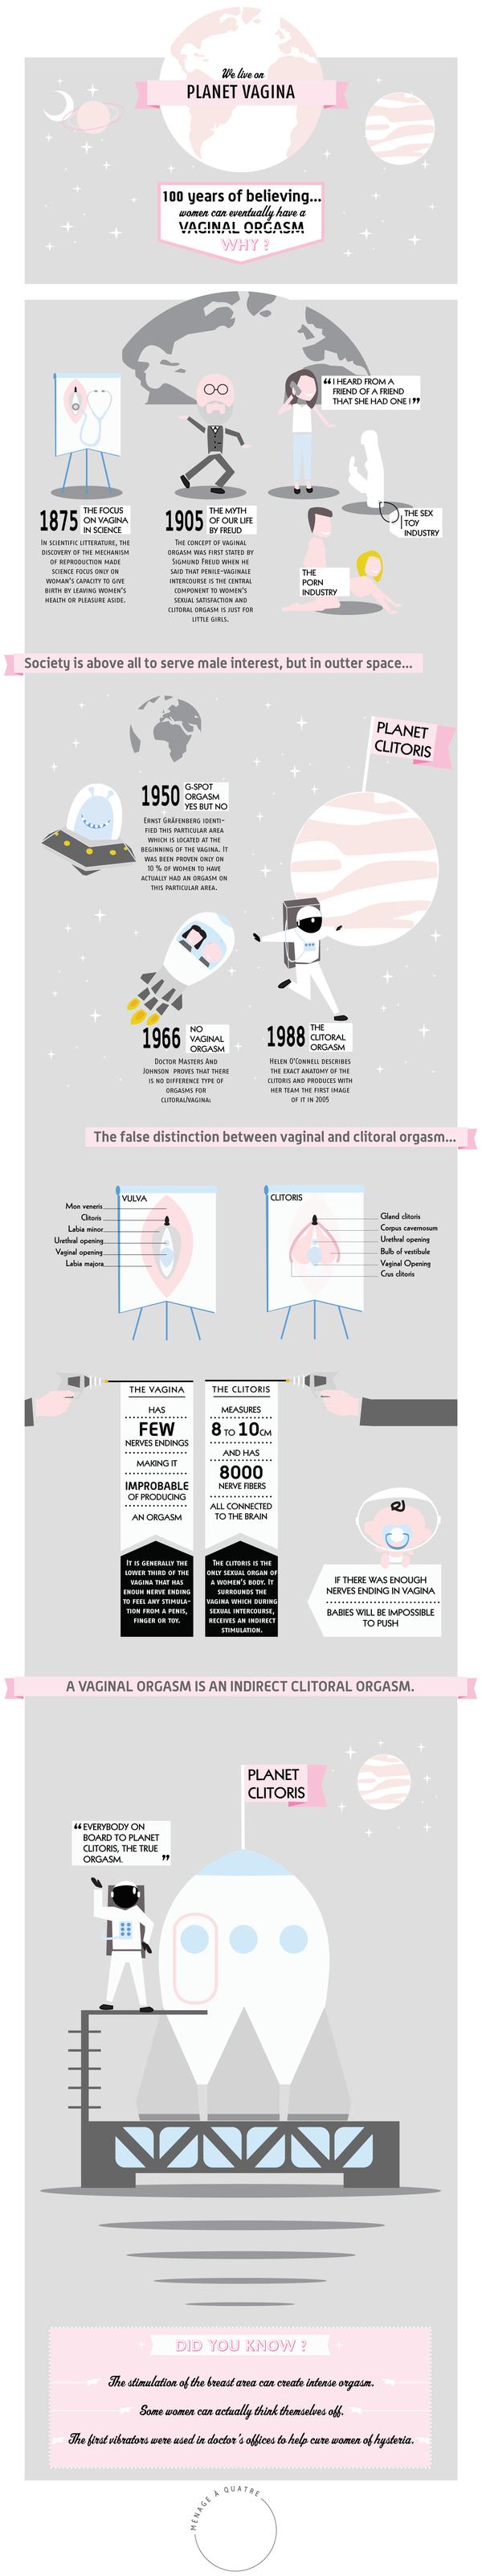 Ménage à Quatee - Infographic